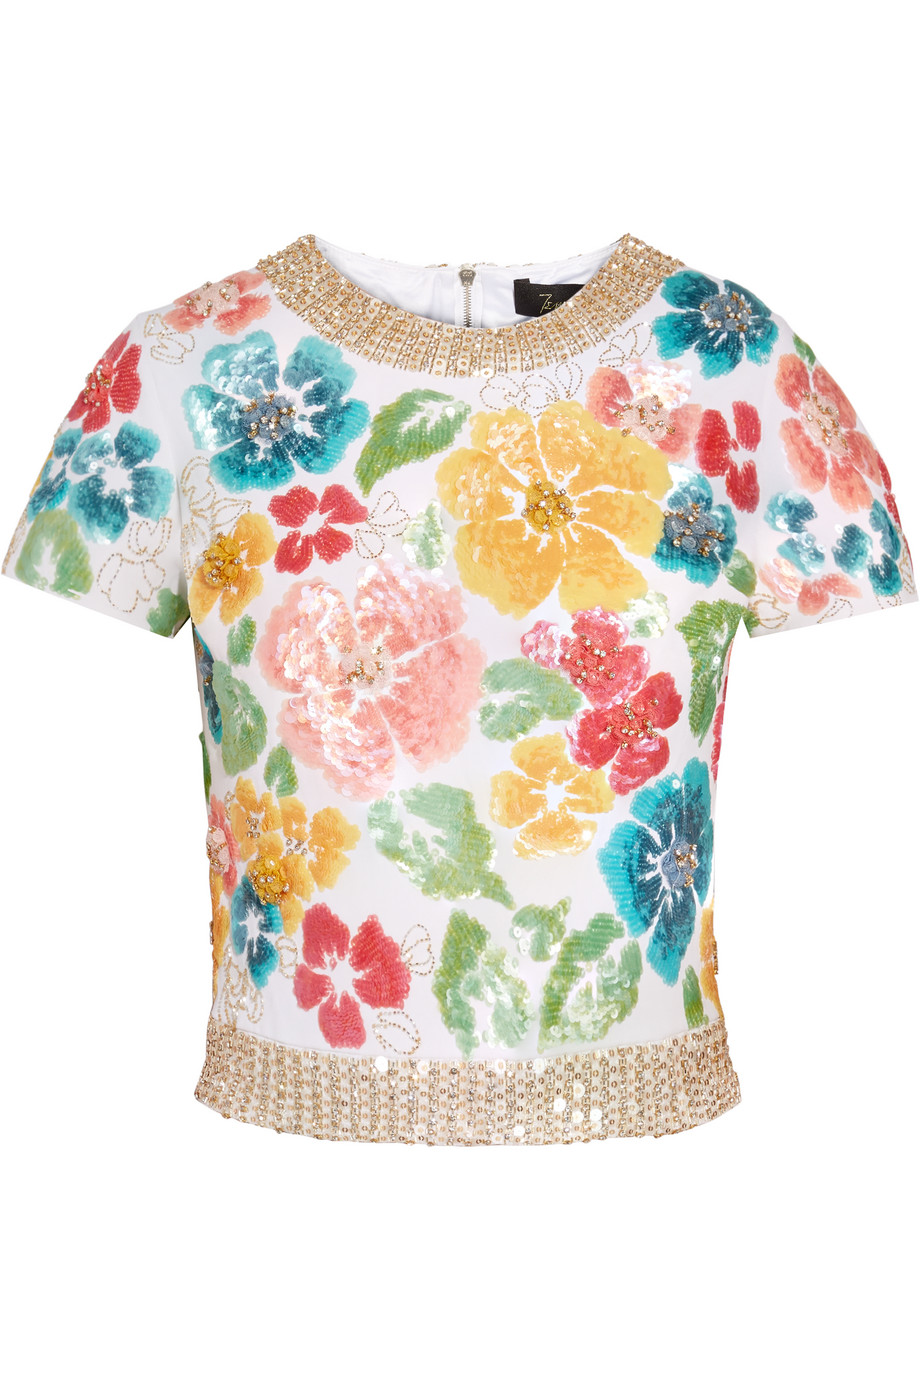 Jenny Packham Embellished Silk-Twill Top, White/Metallic, Women's, Size: 10